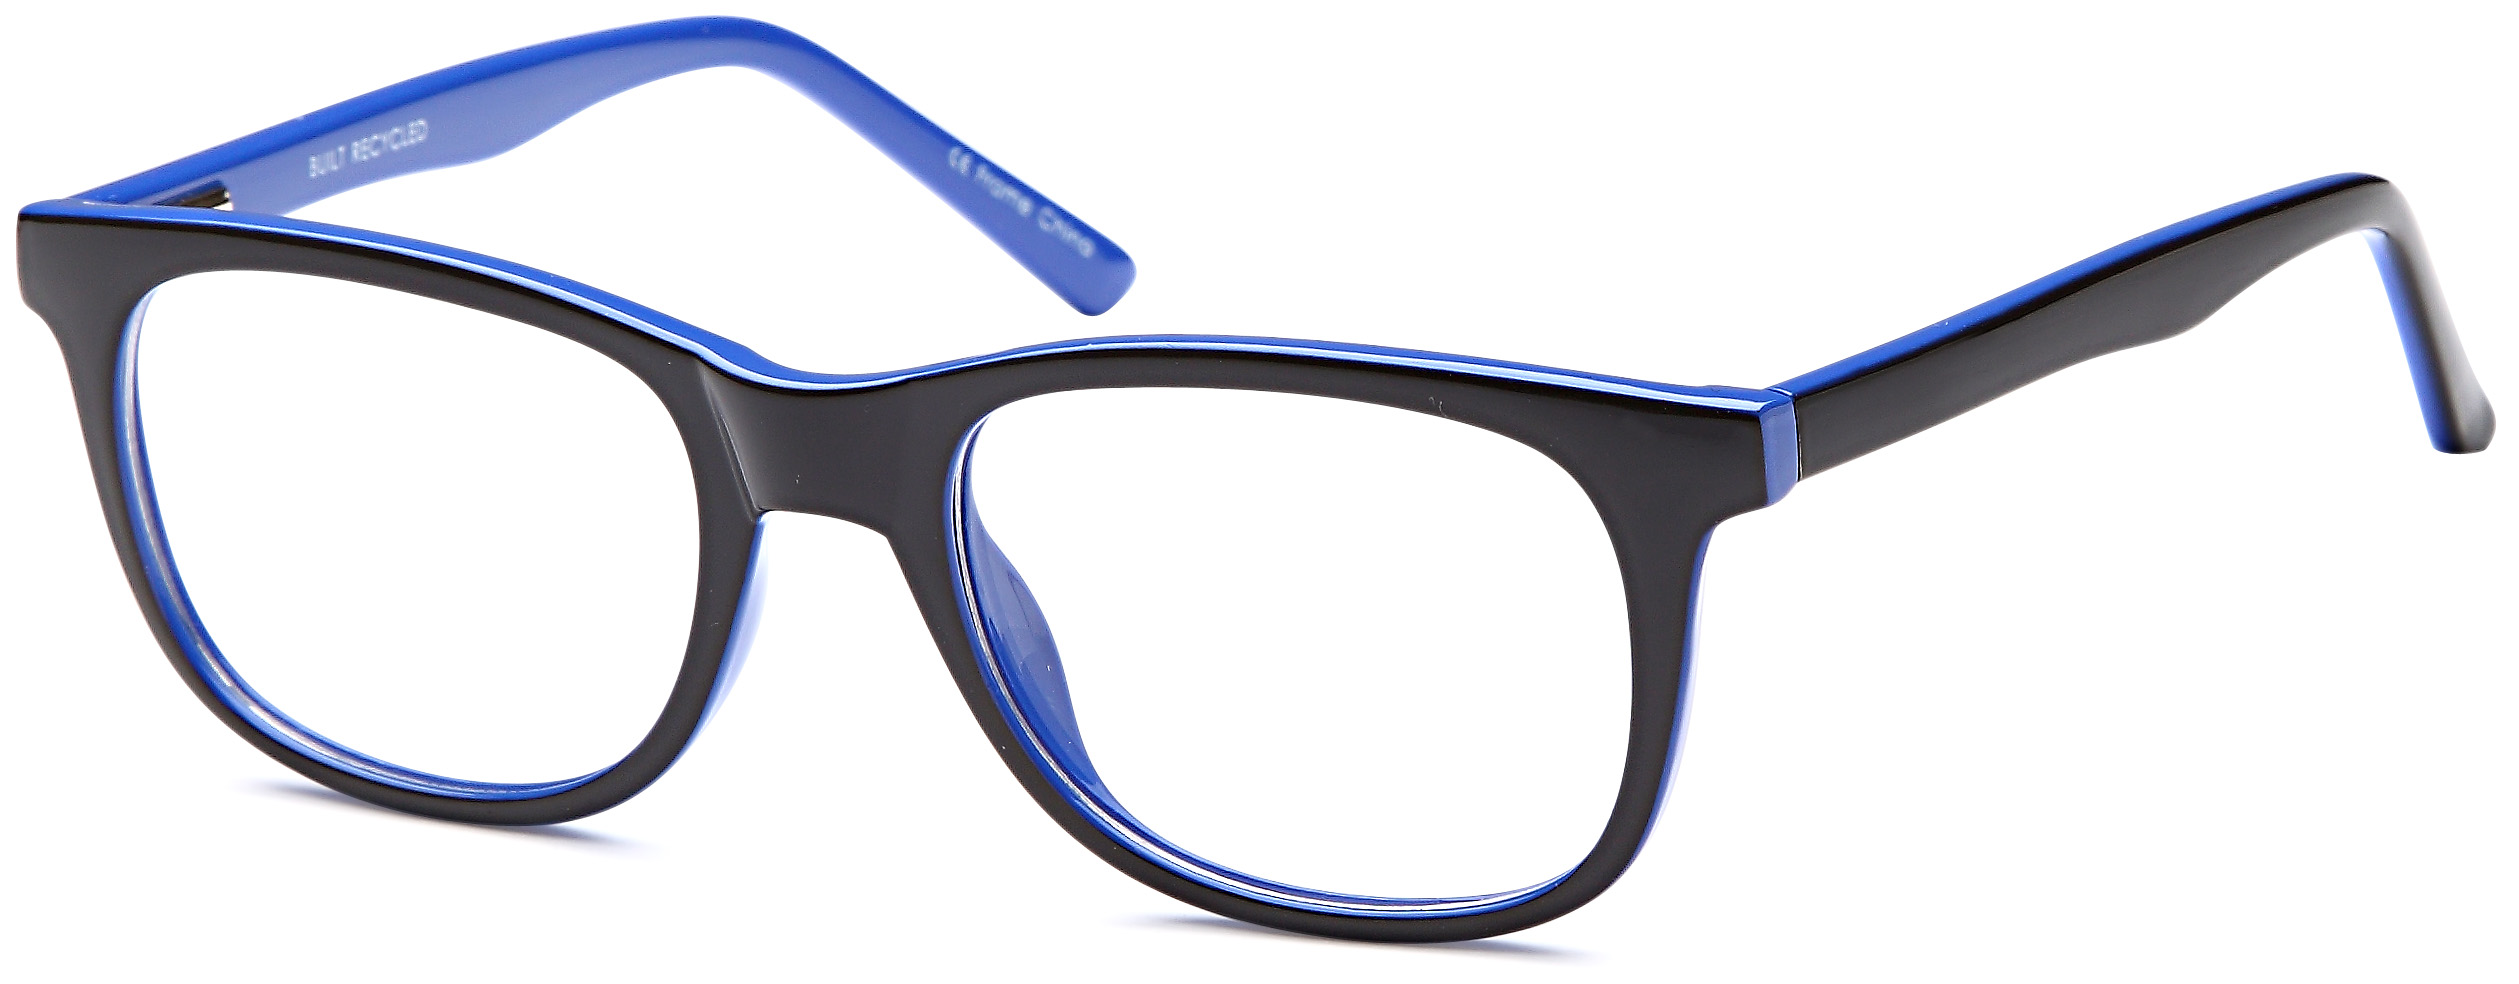 dalix glasses frames in black red womens trendy reading